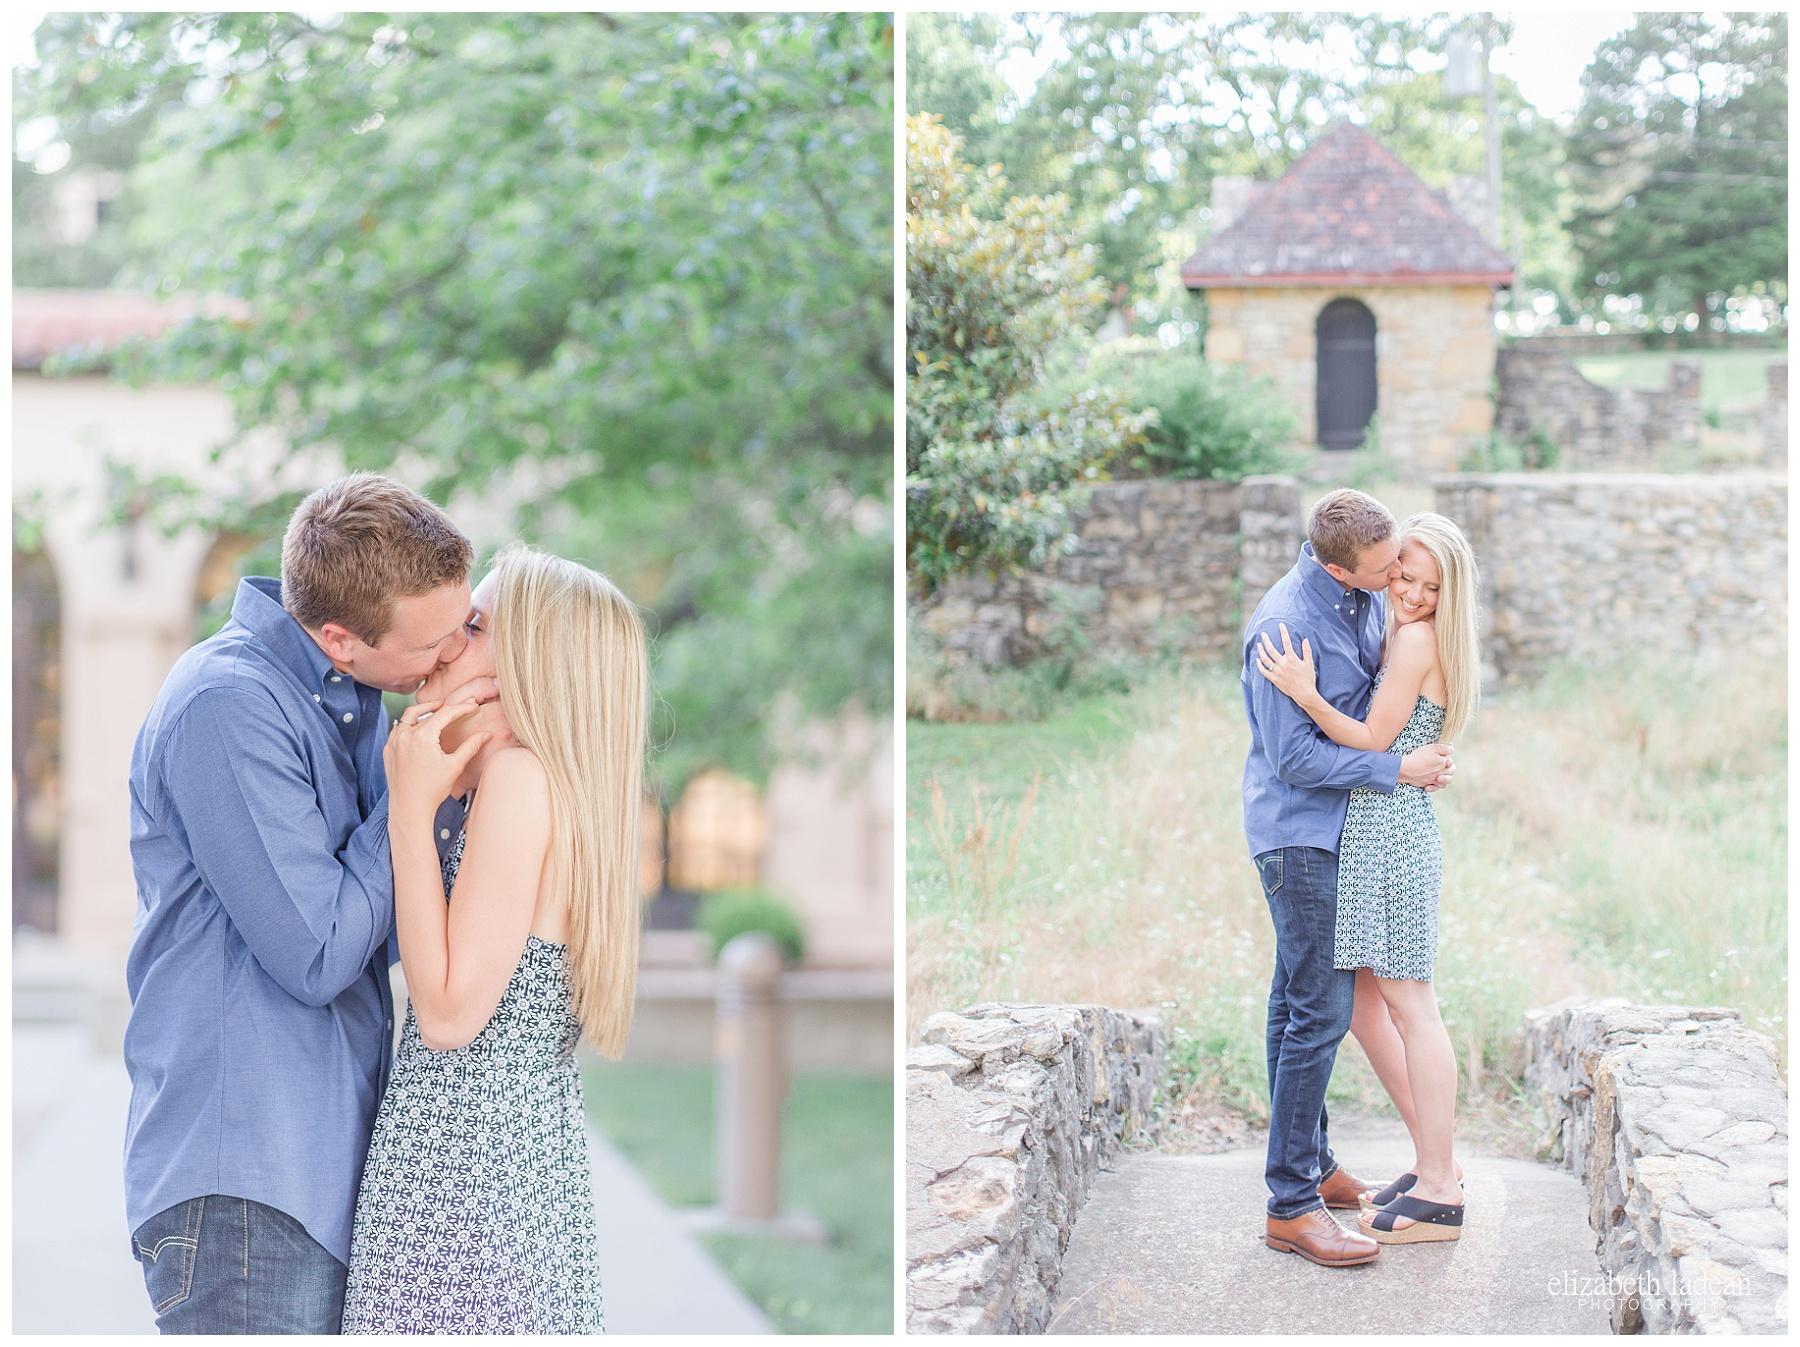 Engagement-Photos-Unity-Village-KC-Photography-A+R-Elizabeth-Ladean-Photography-photo_1371.jpg